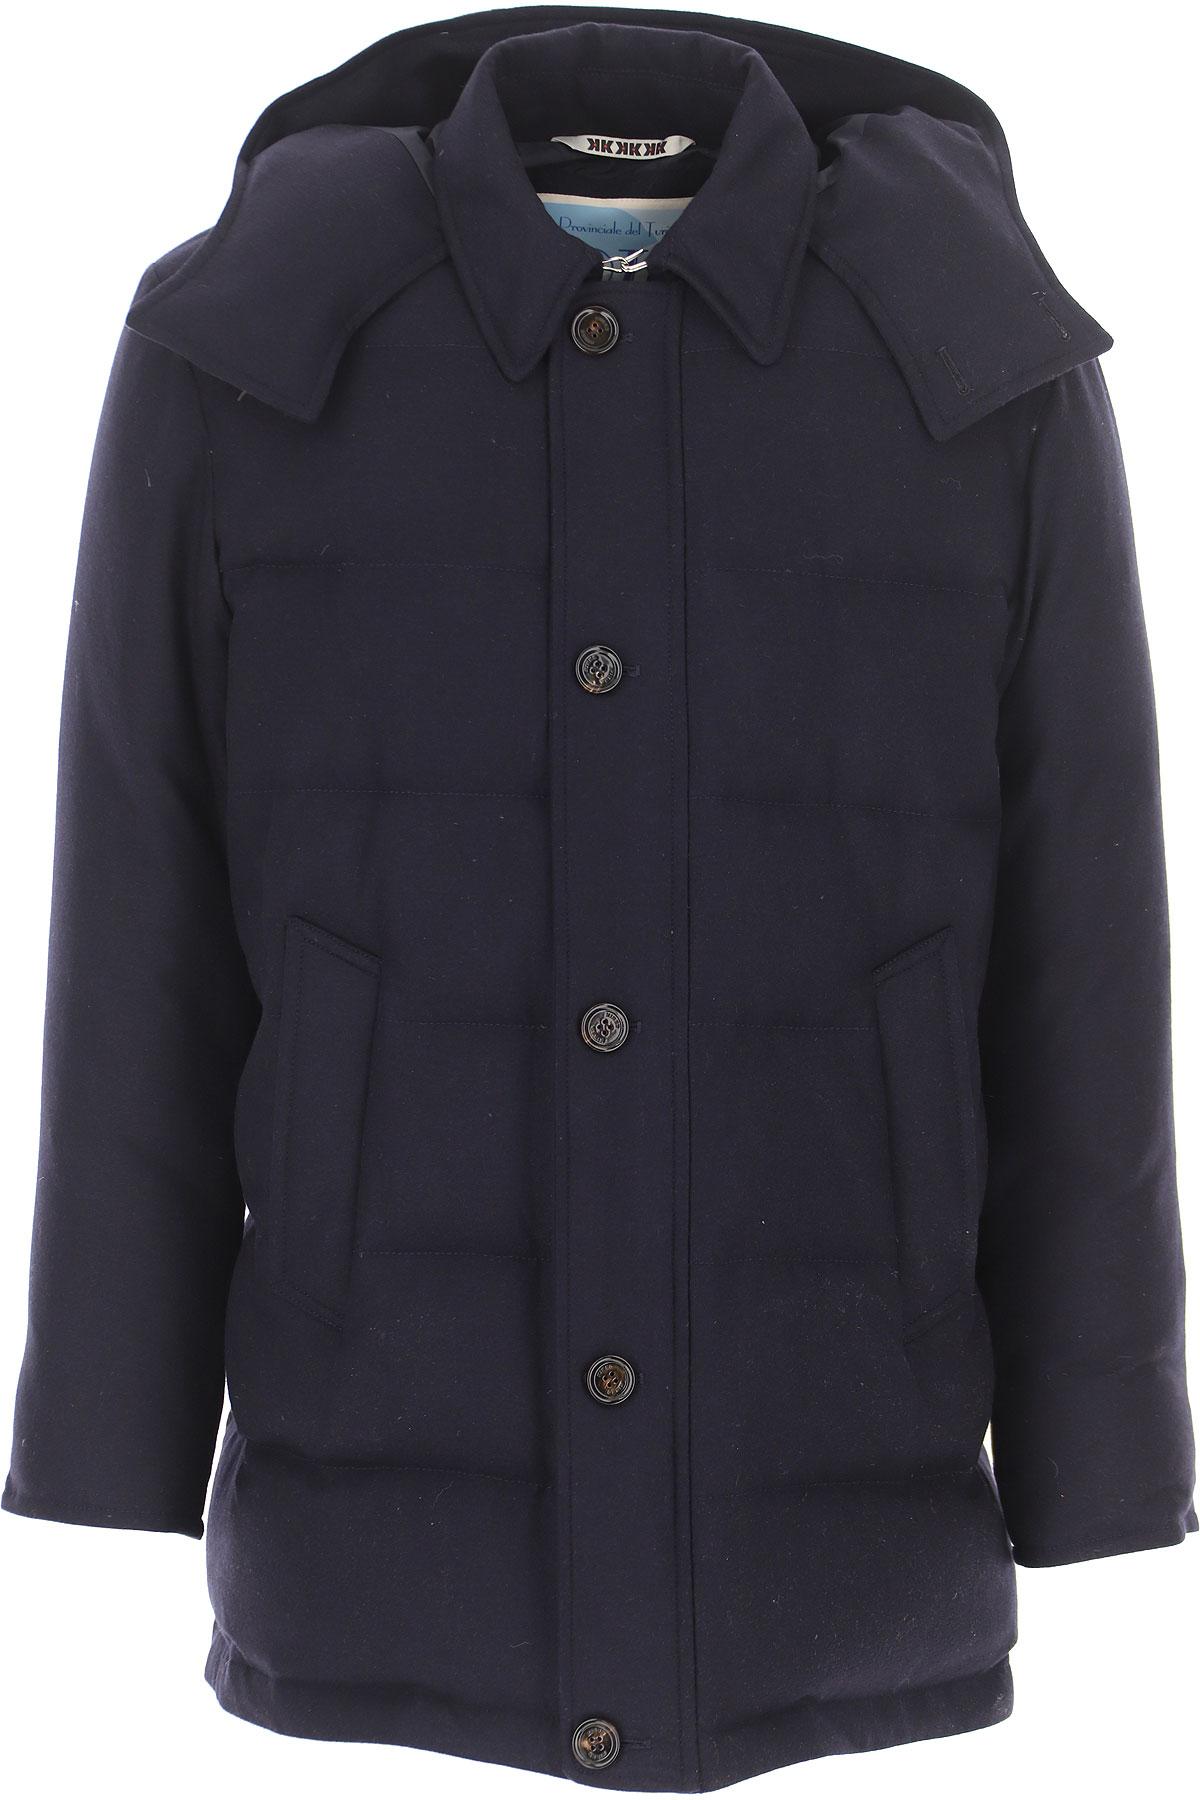 Kired Down Jacket for Men, Puffer Ski Jacket On Sale, navy, Wool, 2019, L M S XL XXL